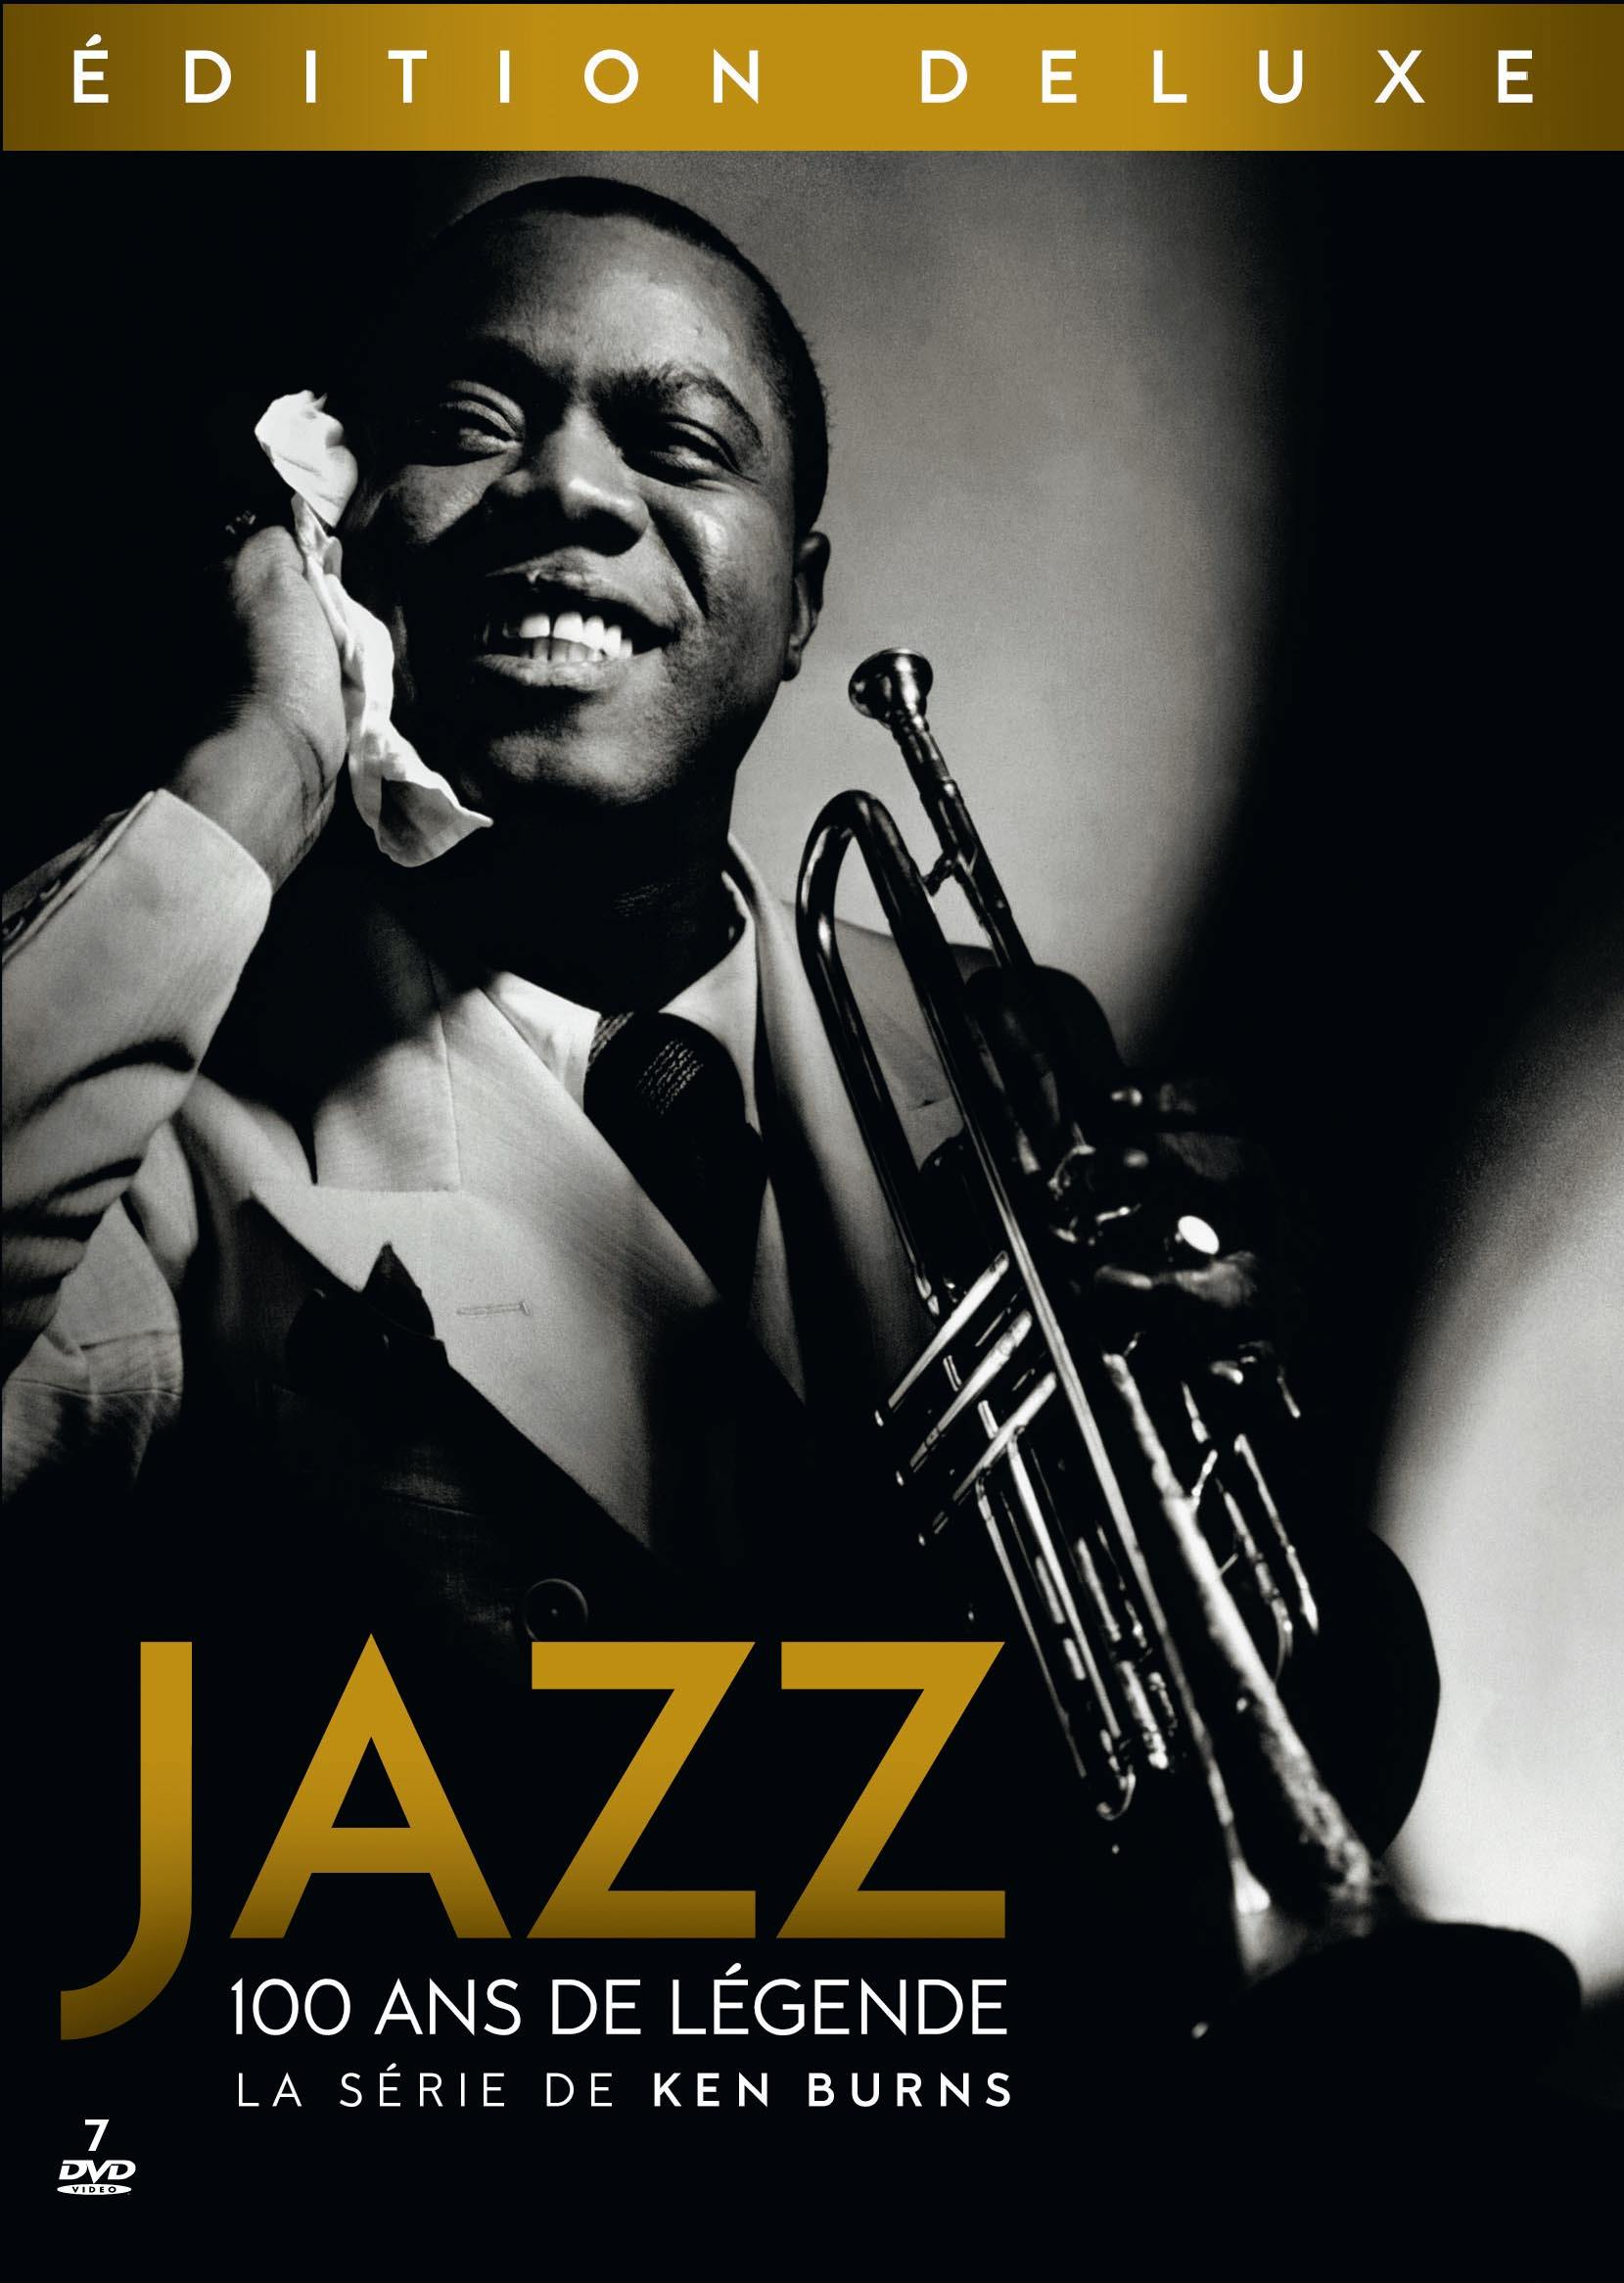 Jazz 100 ans de legende - 7 dvd